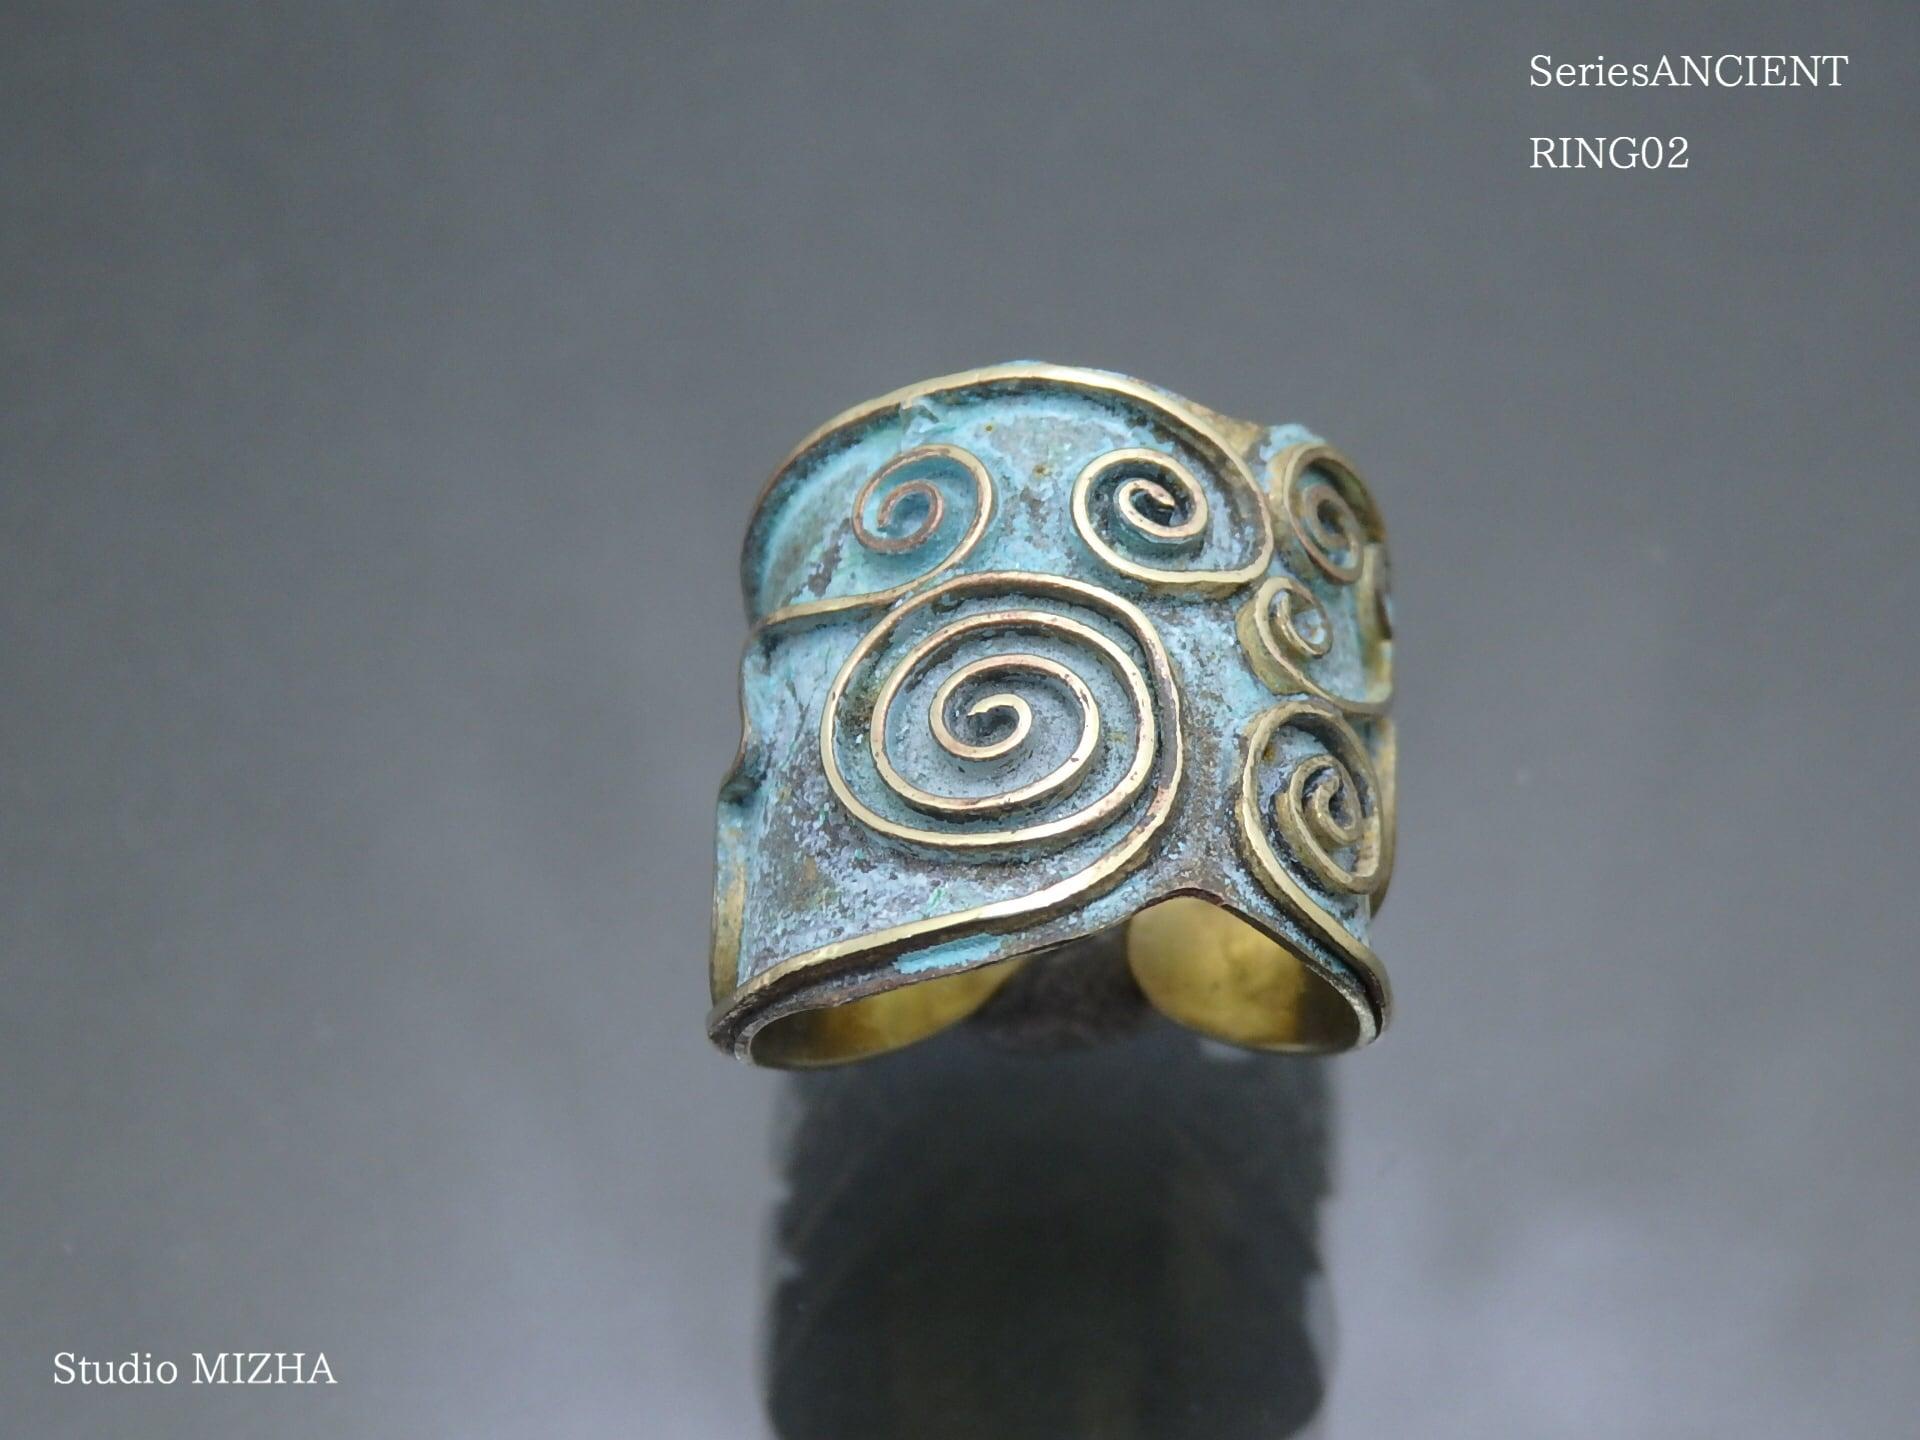 ANCIENT(RING-02)